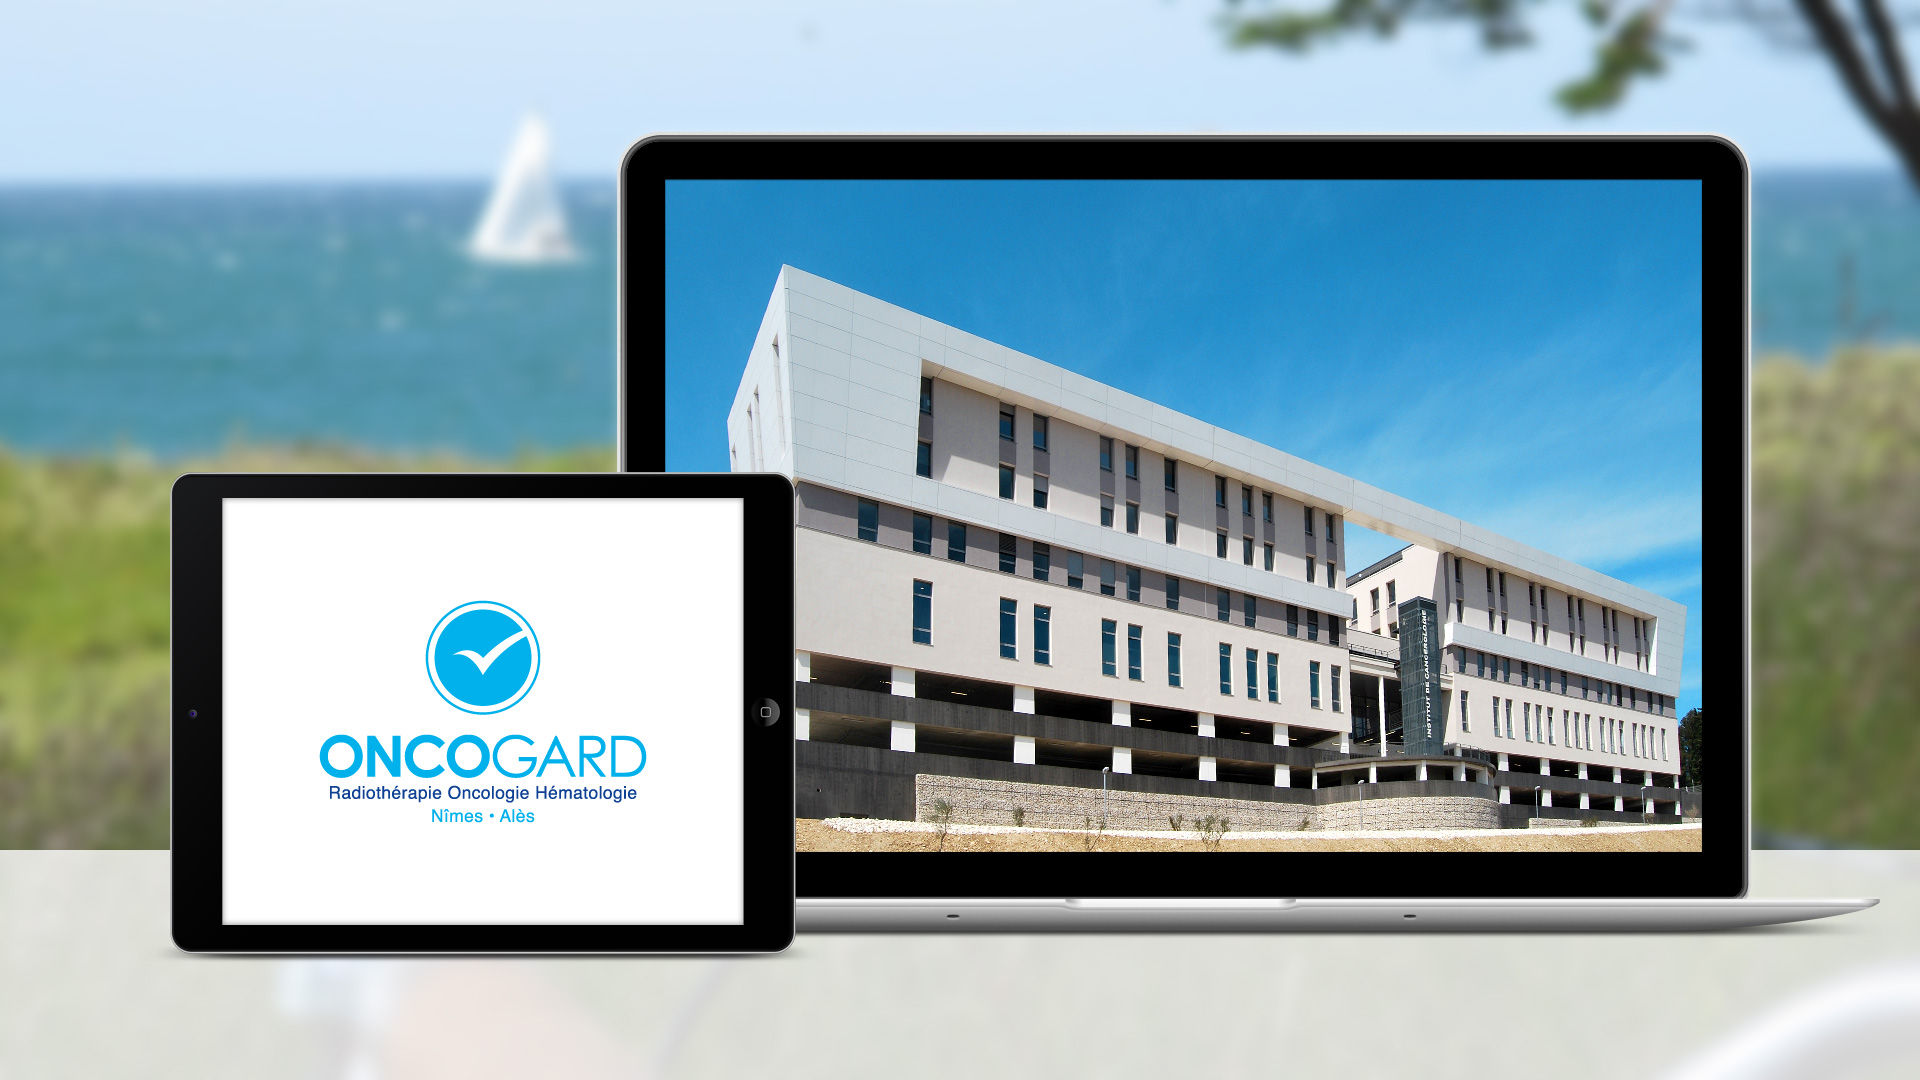 oncogard-creation-logo-site-internet-communication-caconcept-alexis-cretin-graphiste-montpellier